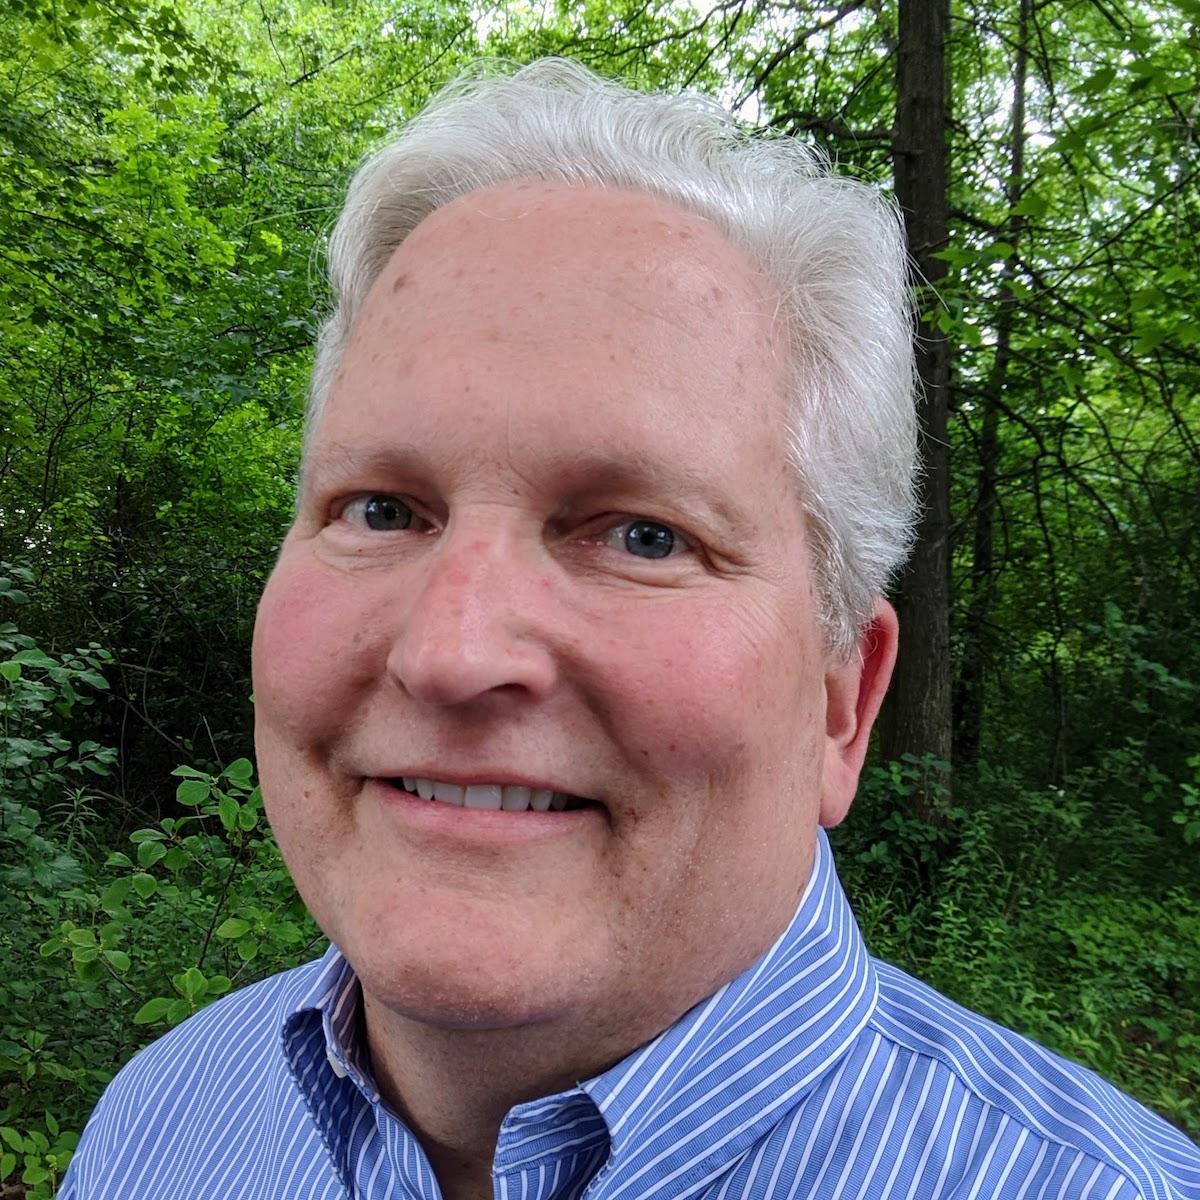 Image of Greg Jackson